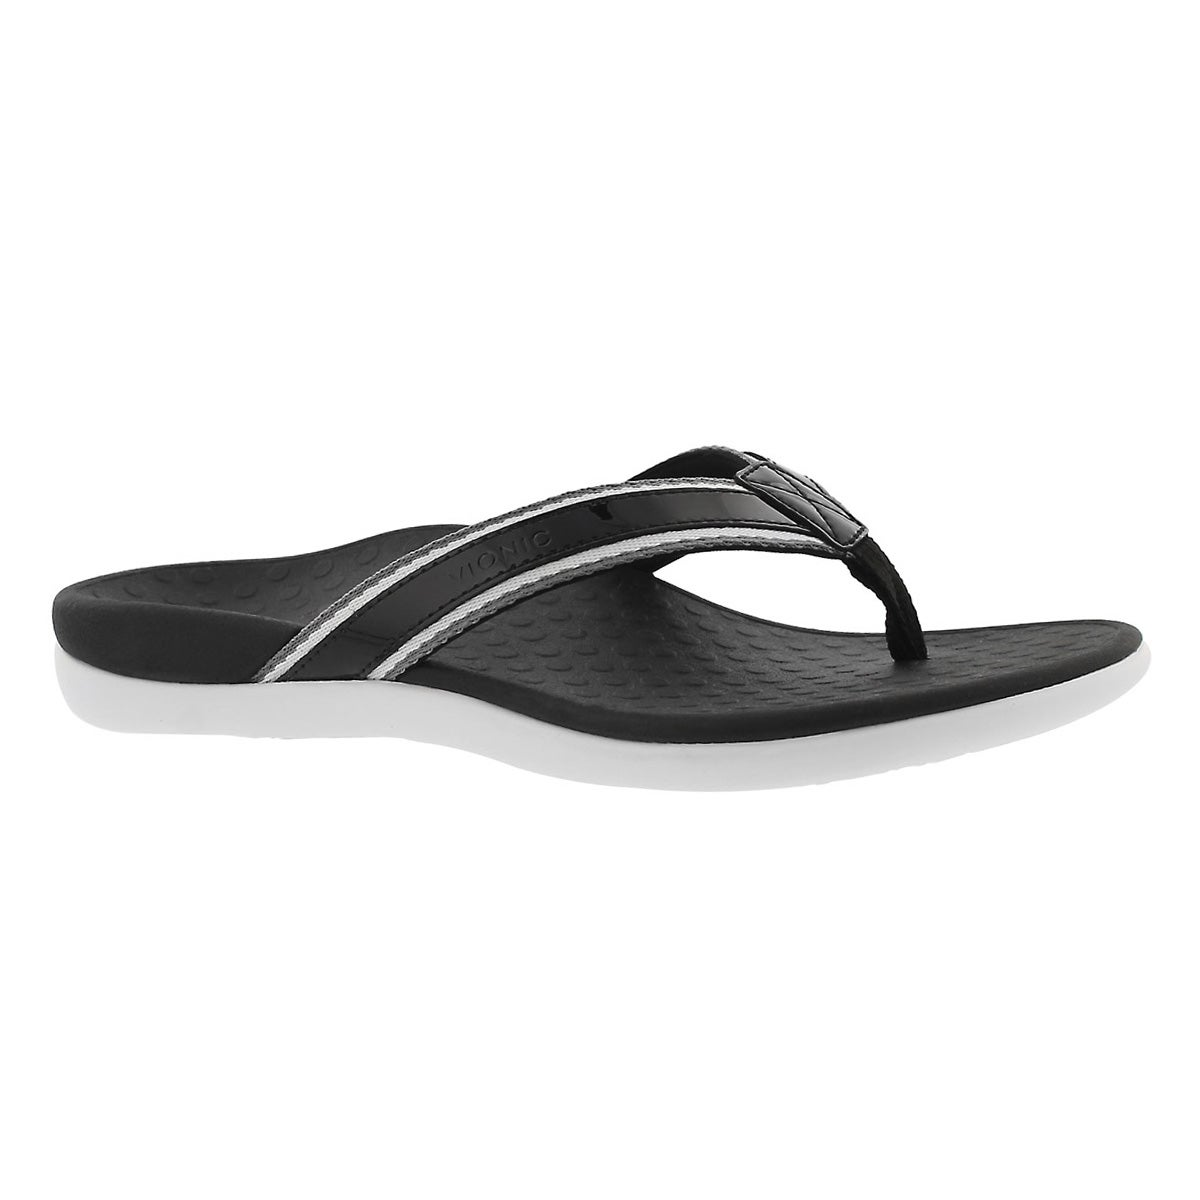 Women's TIDE SPORT blk arch support thong sandals